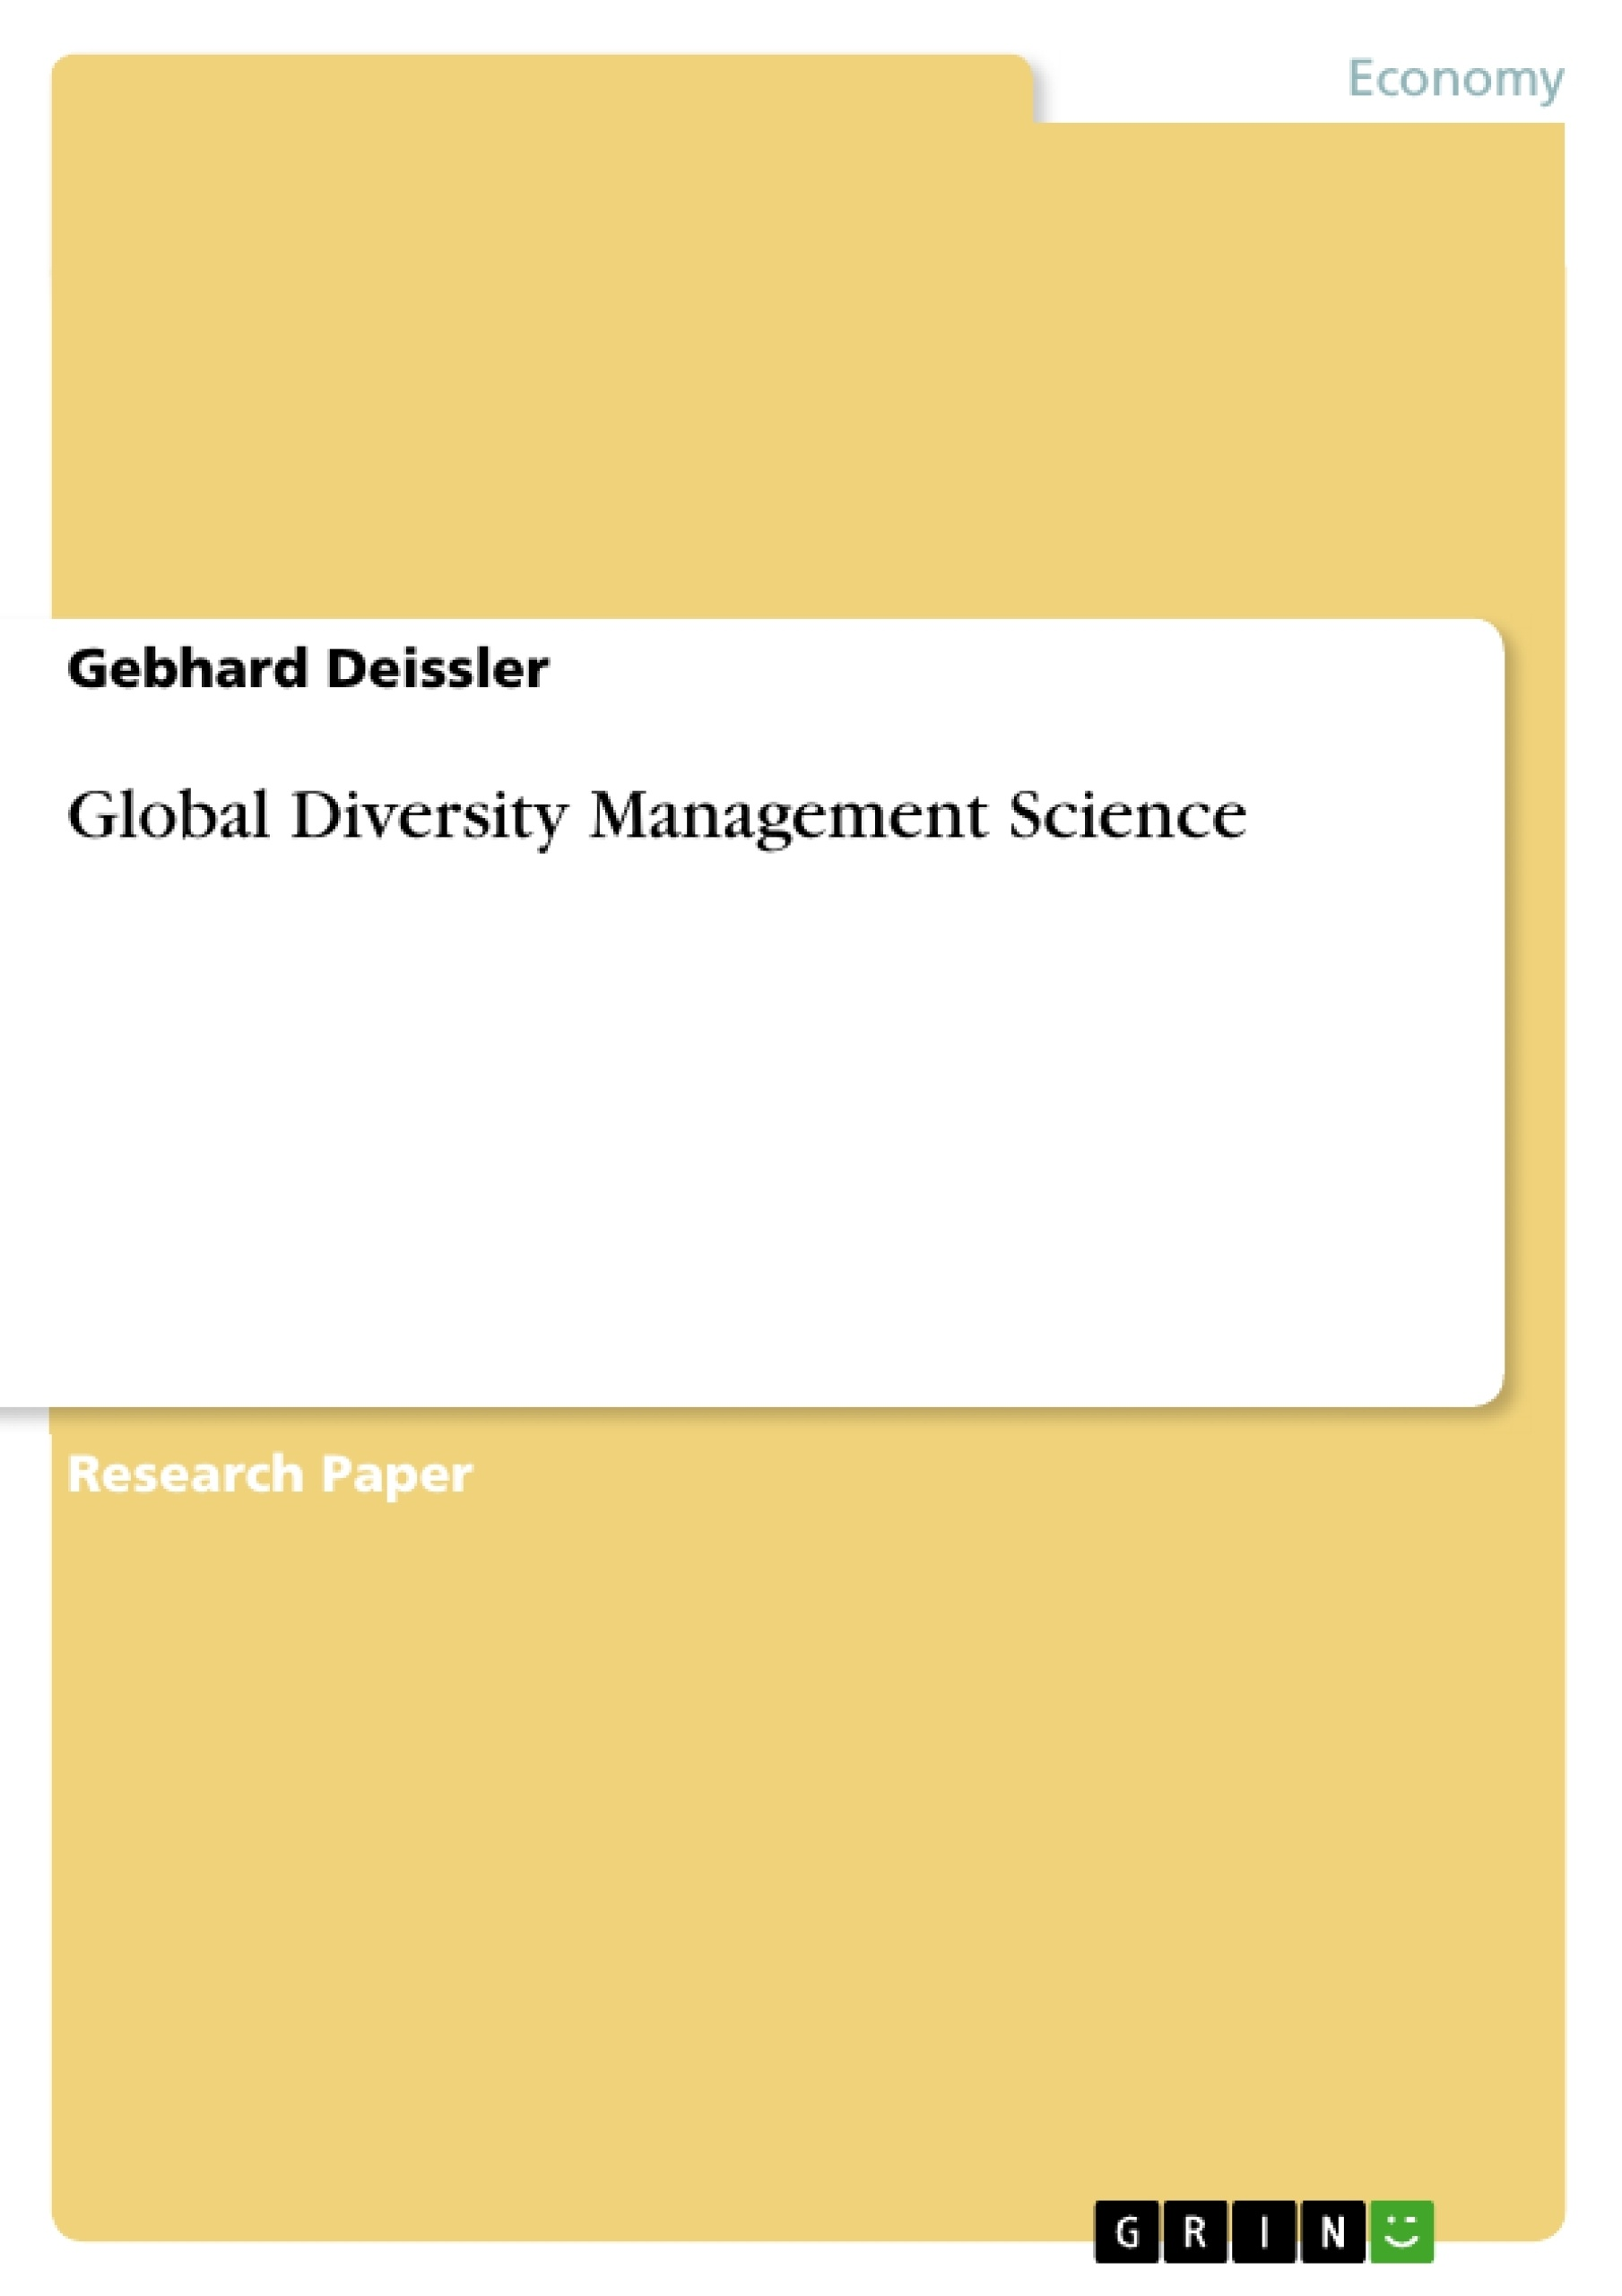 Title: Global Diversity Management Science